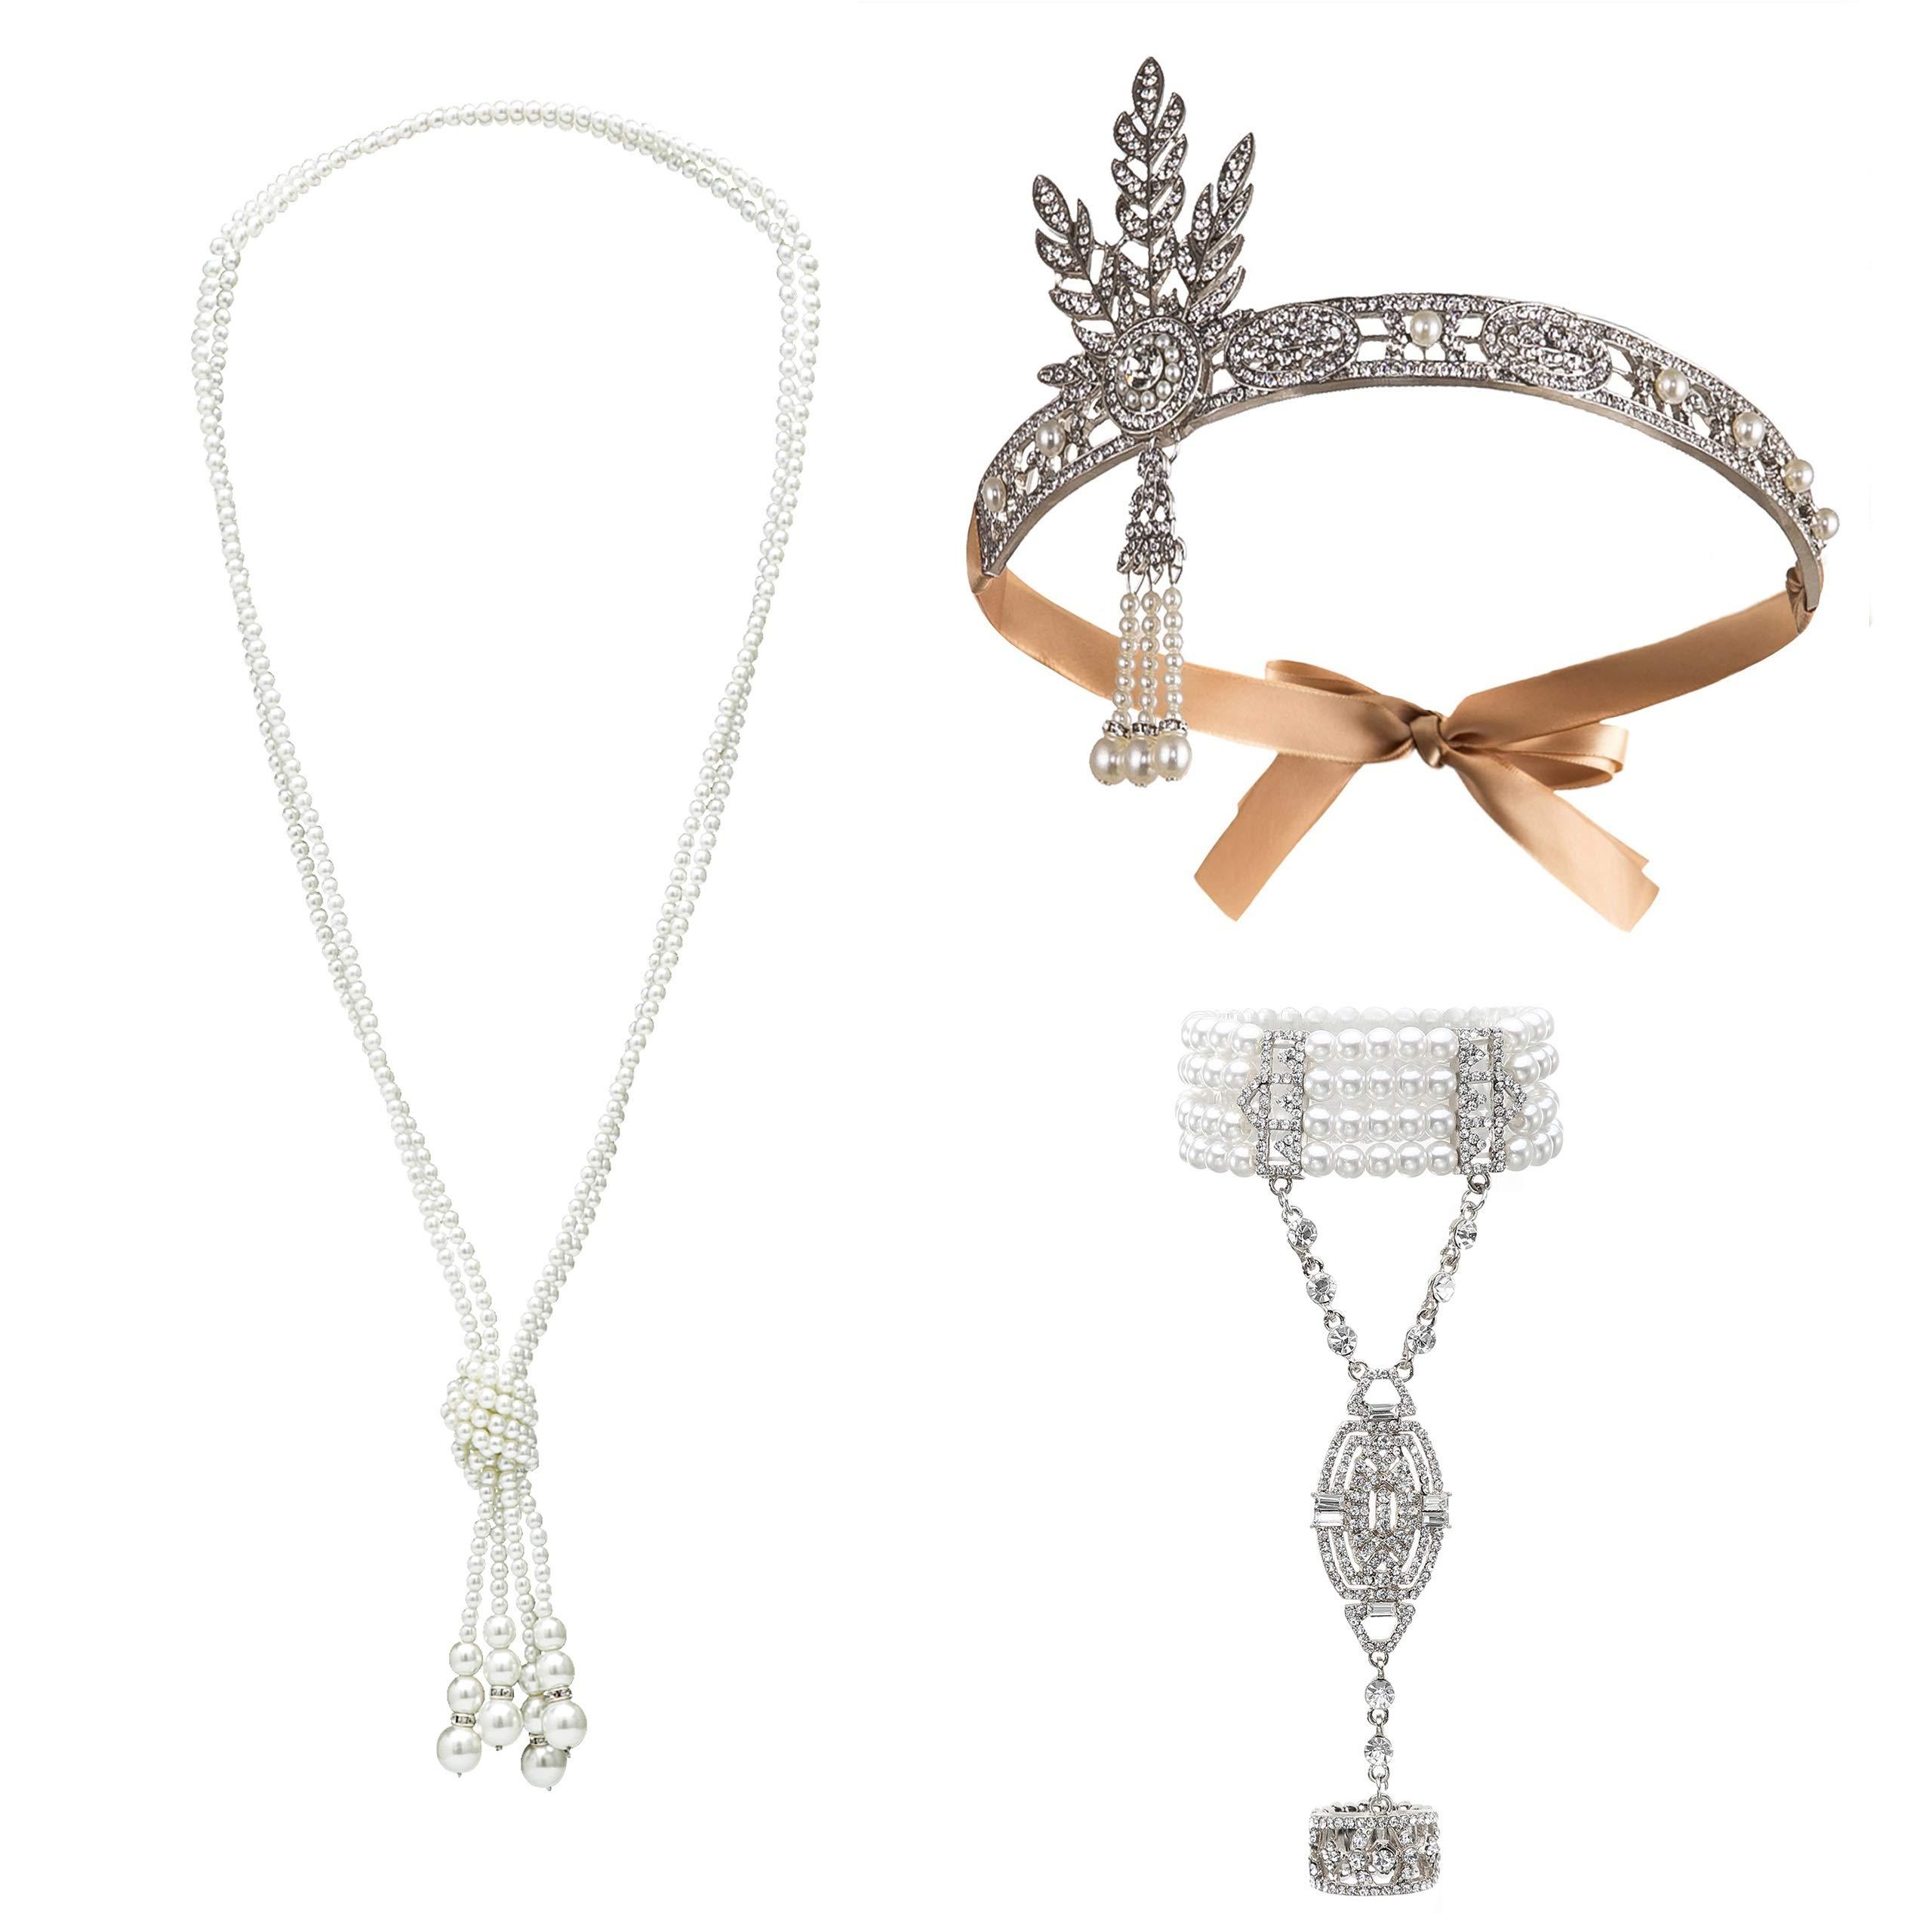 Radtengle Great Gatsby Accessories Set for Women 1920s Flapper Necklace Headband Bracelets Costume Jewelry